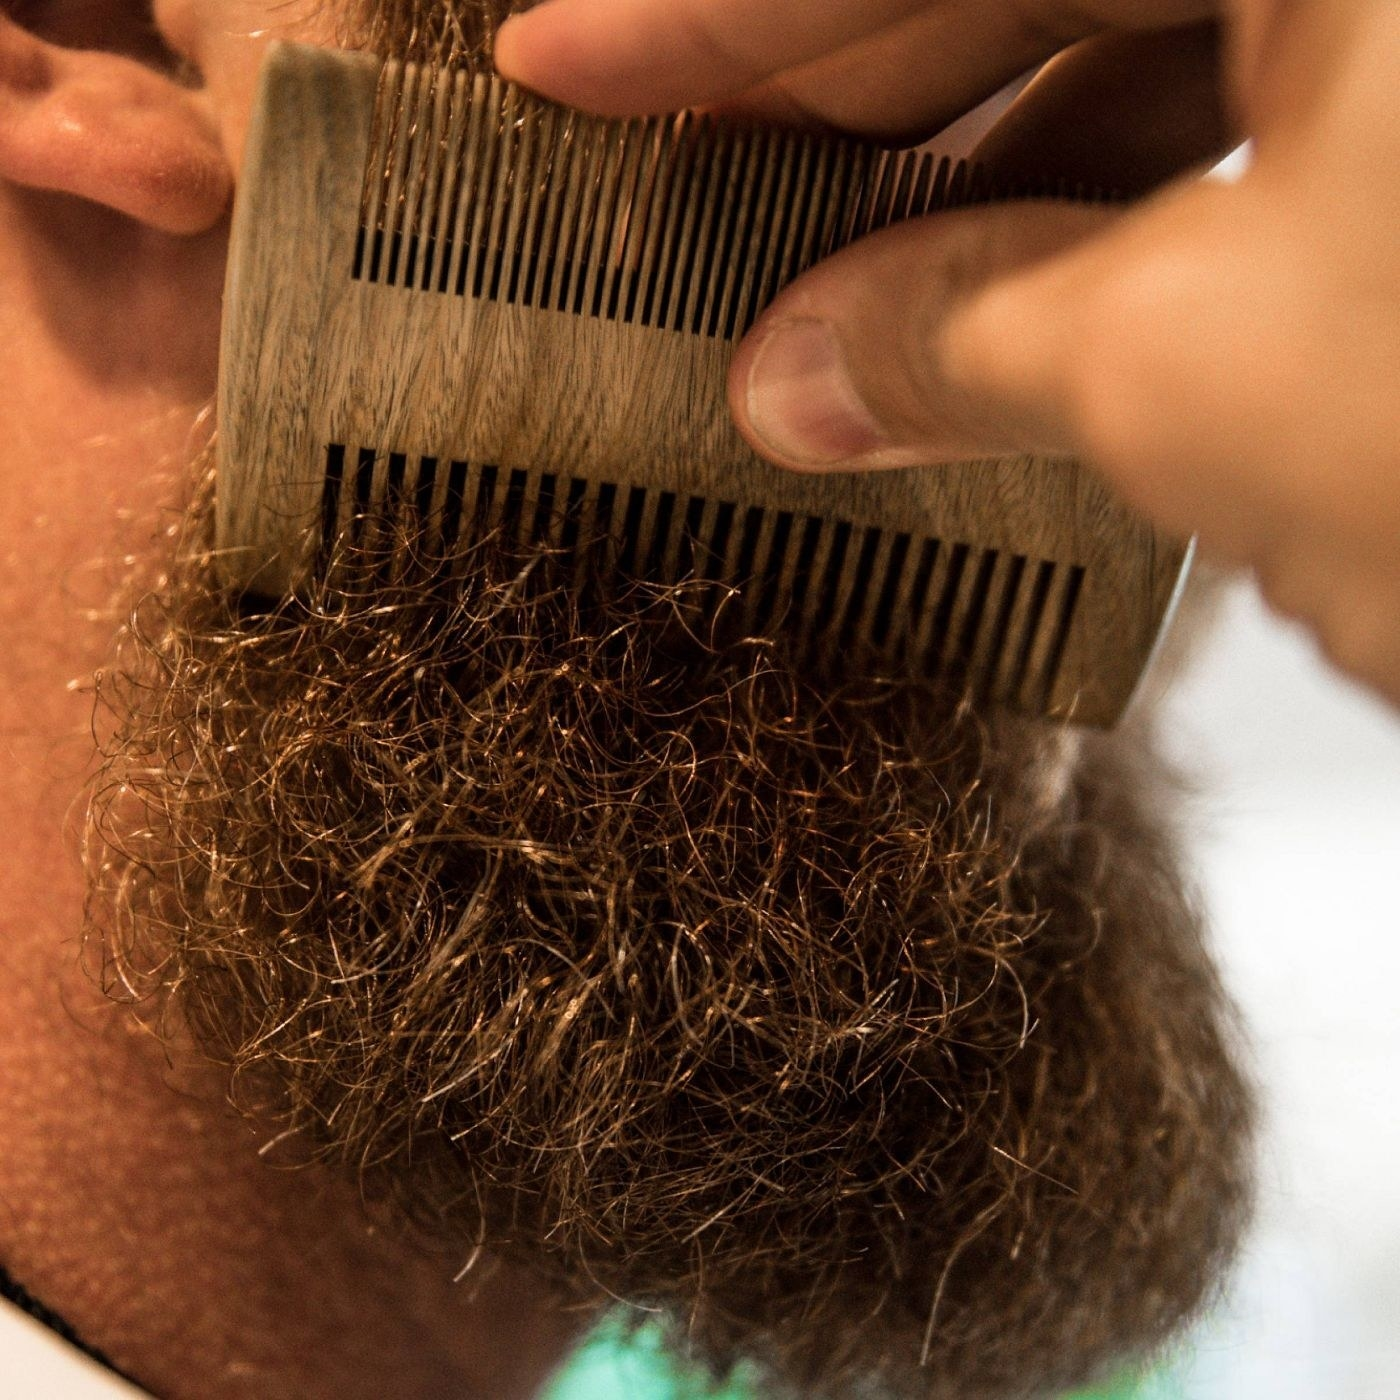 Model using the beard comb